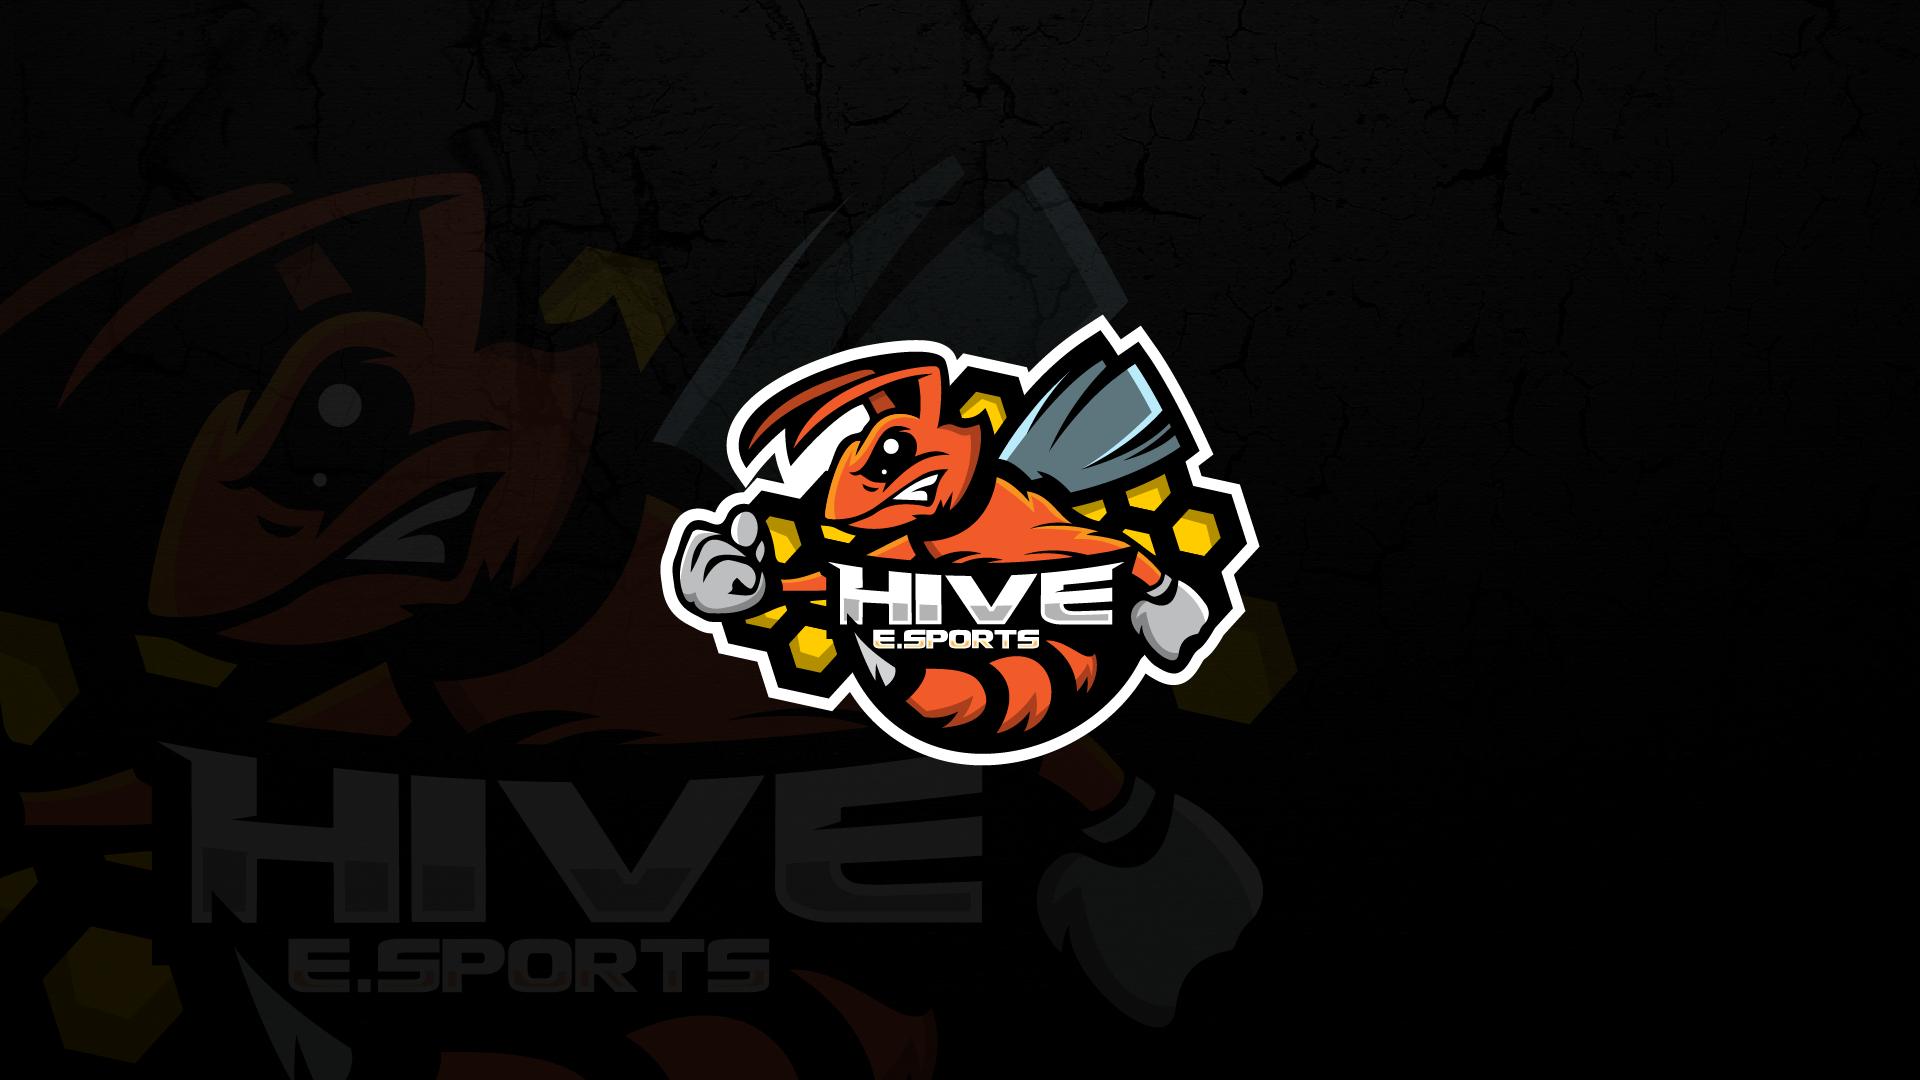 Hive E.Sports